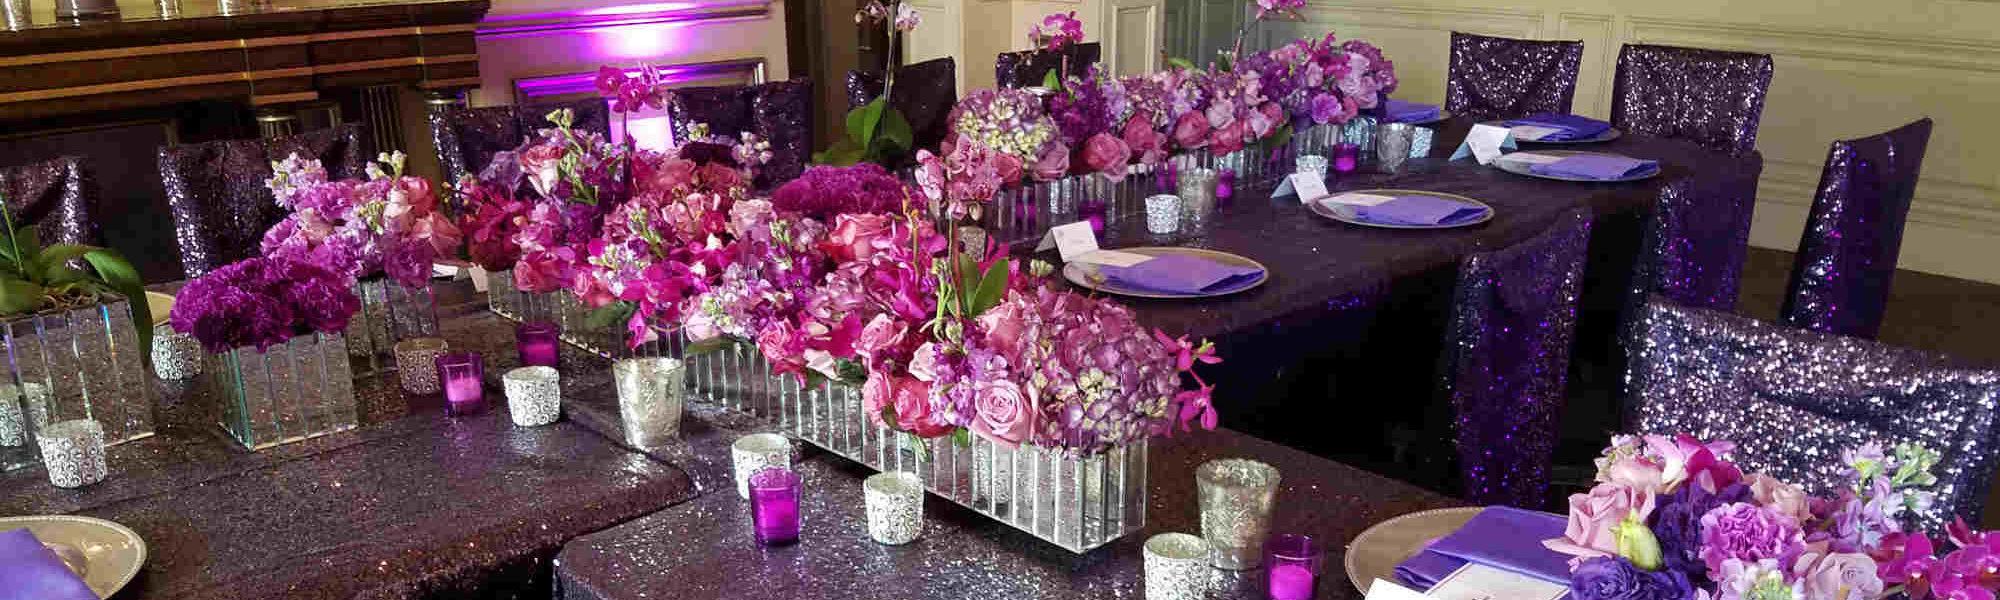 Kathy Deal Prince Prom slider